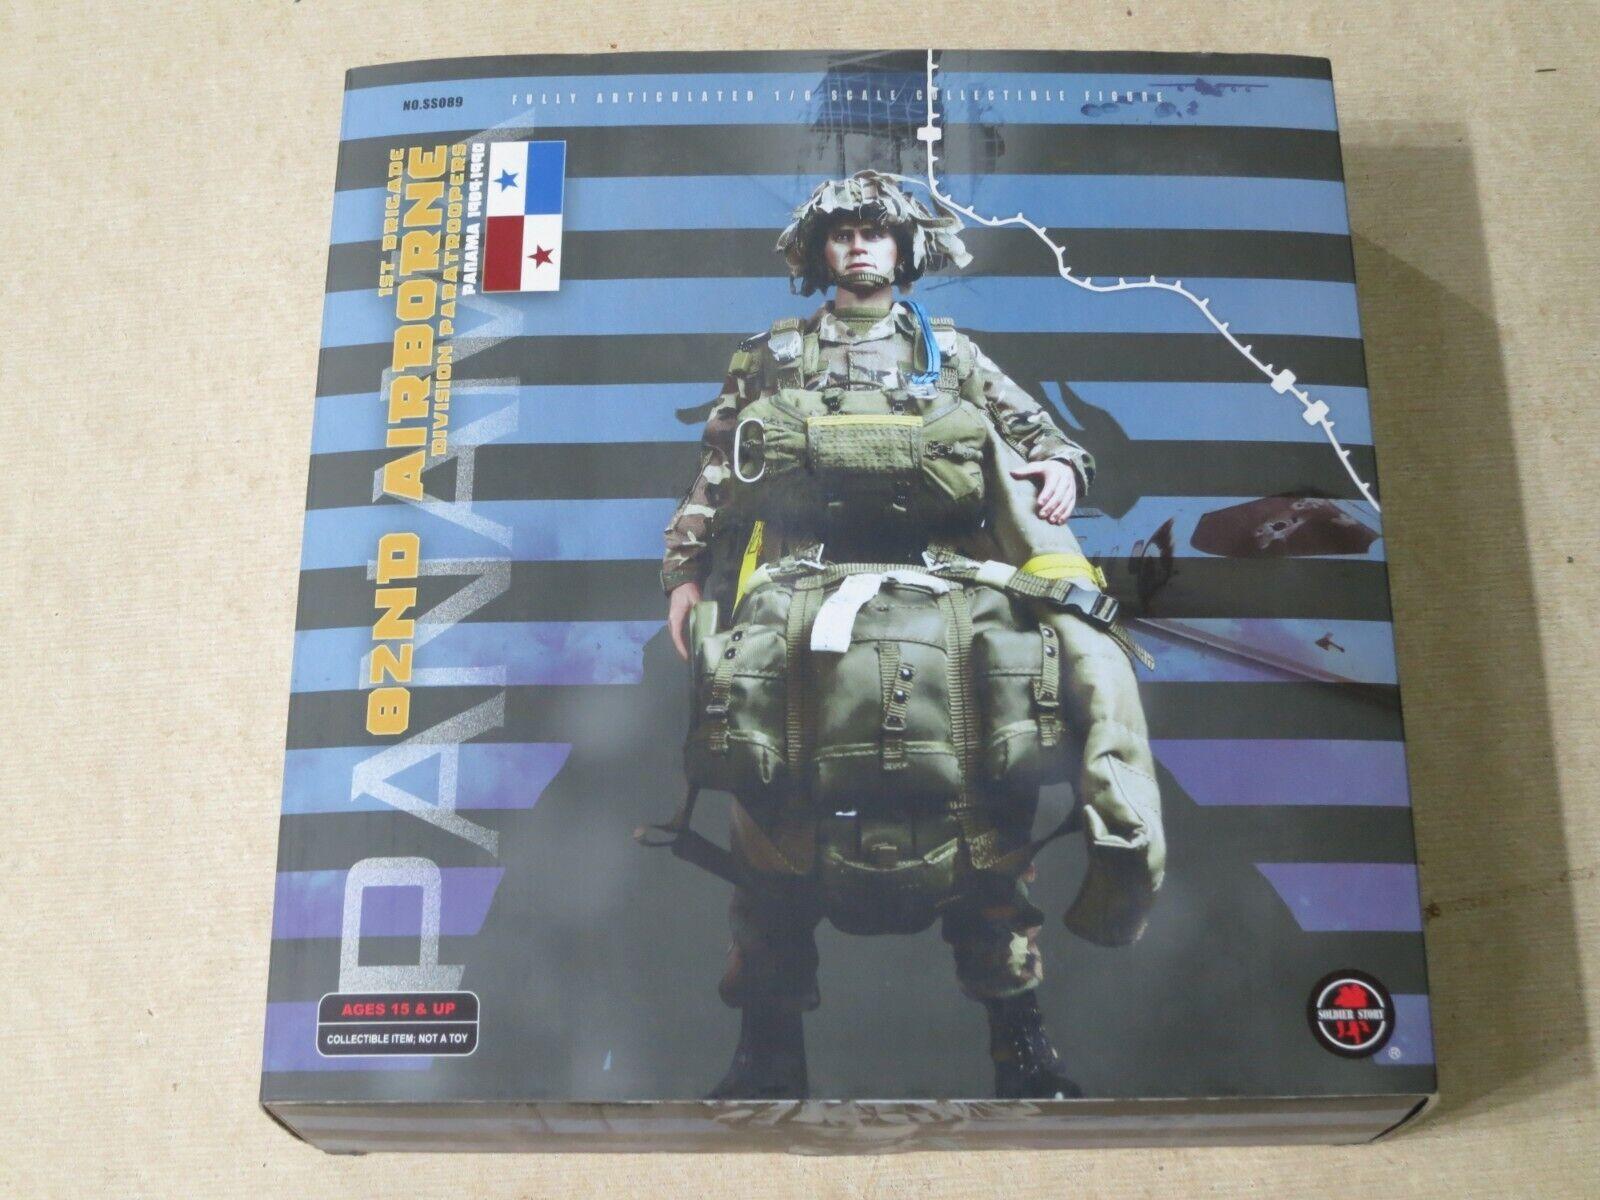 SOLDIER STORY 82nd Airborne Division paracaidistas Panamá 1989-90 Nuevo Figura de 12